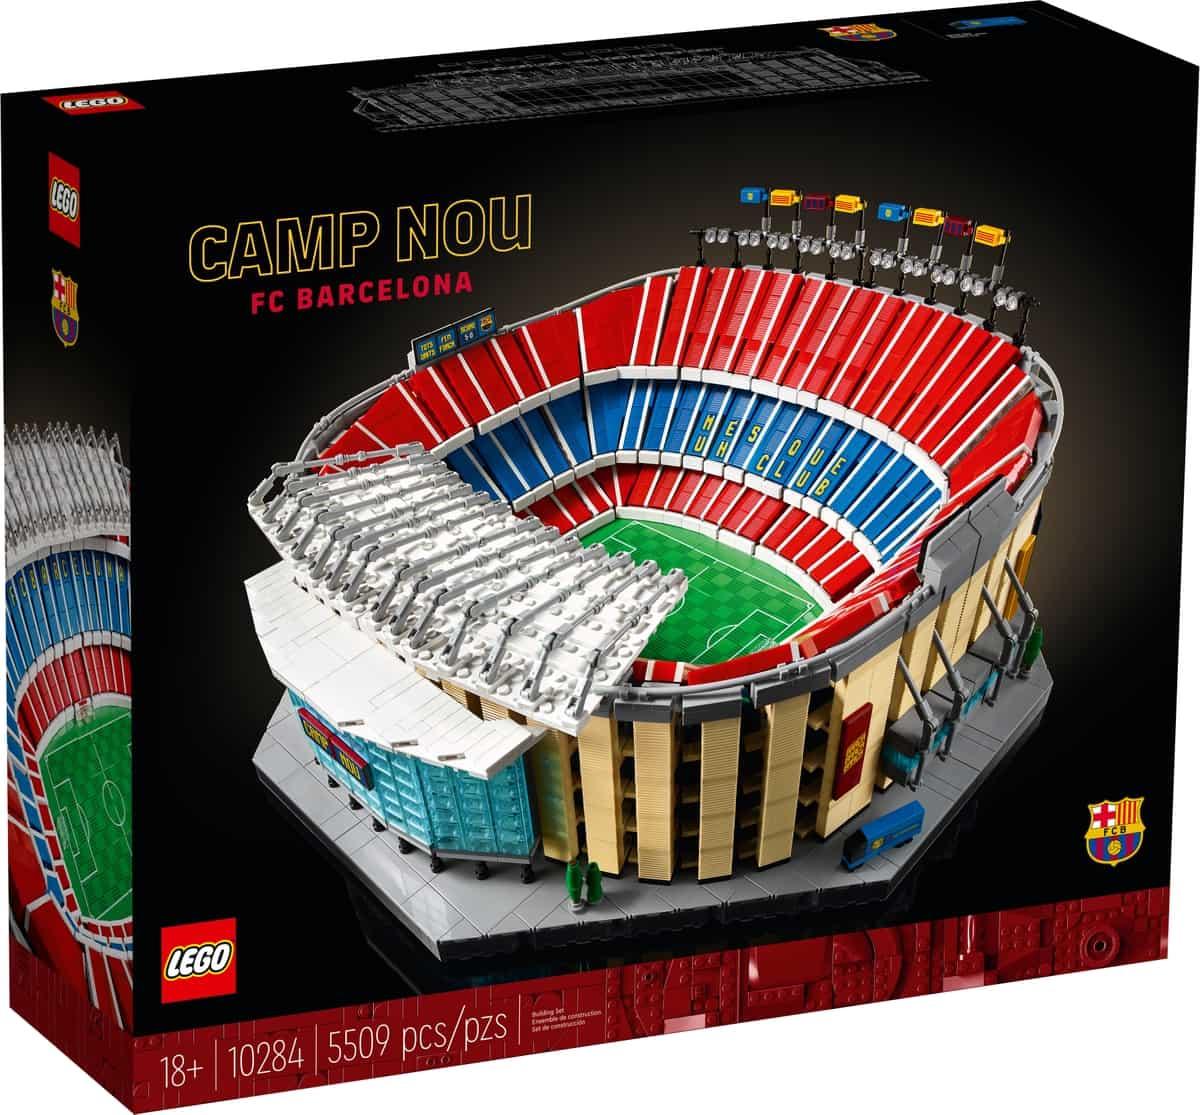 LEGO 10284 Štadión Vamp Nou – FC Barcelona